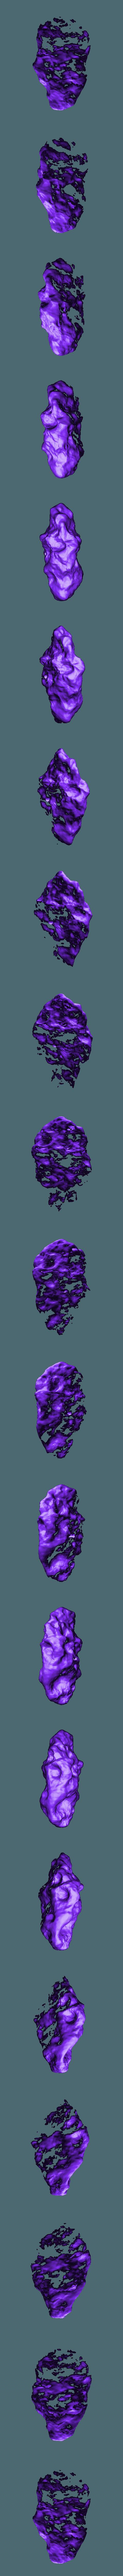 large.stl Download free STL file The Space Set • 3D print design, HeribertoValle